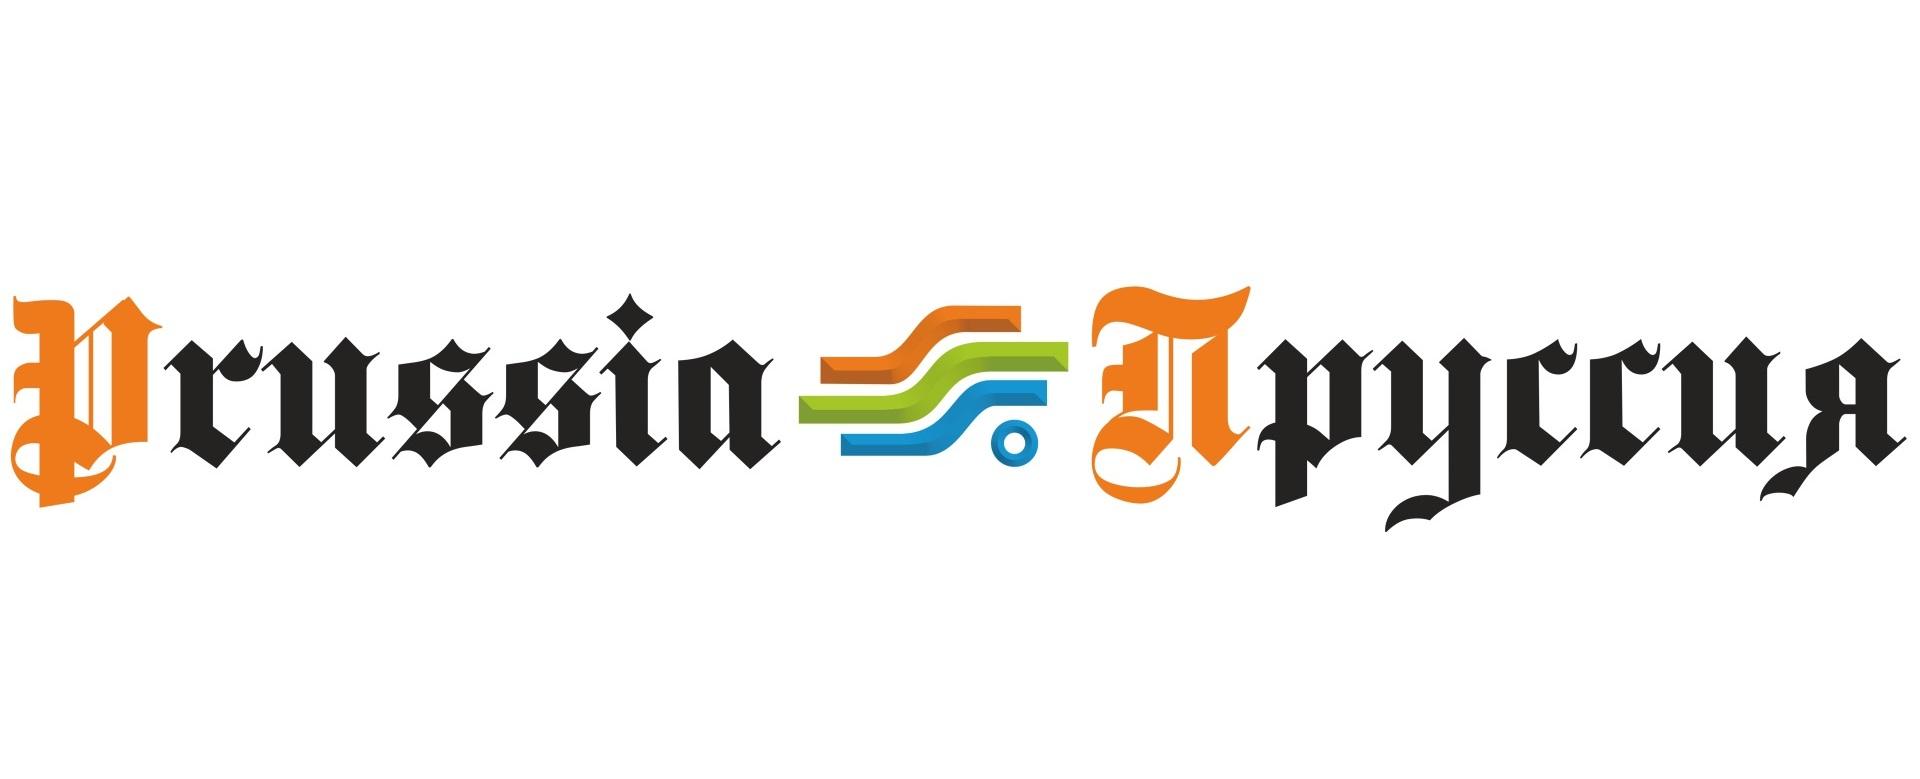 Логотип Prussia